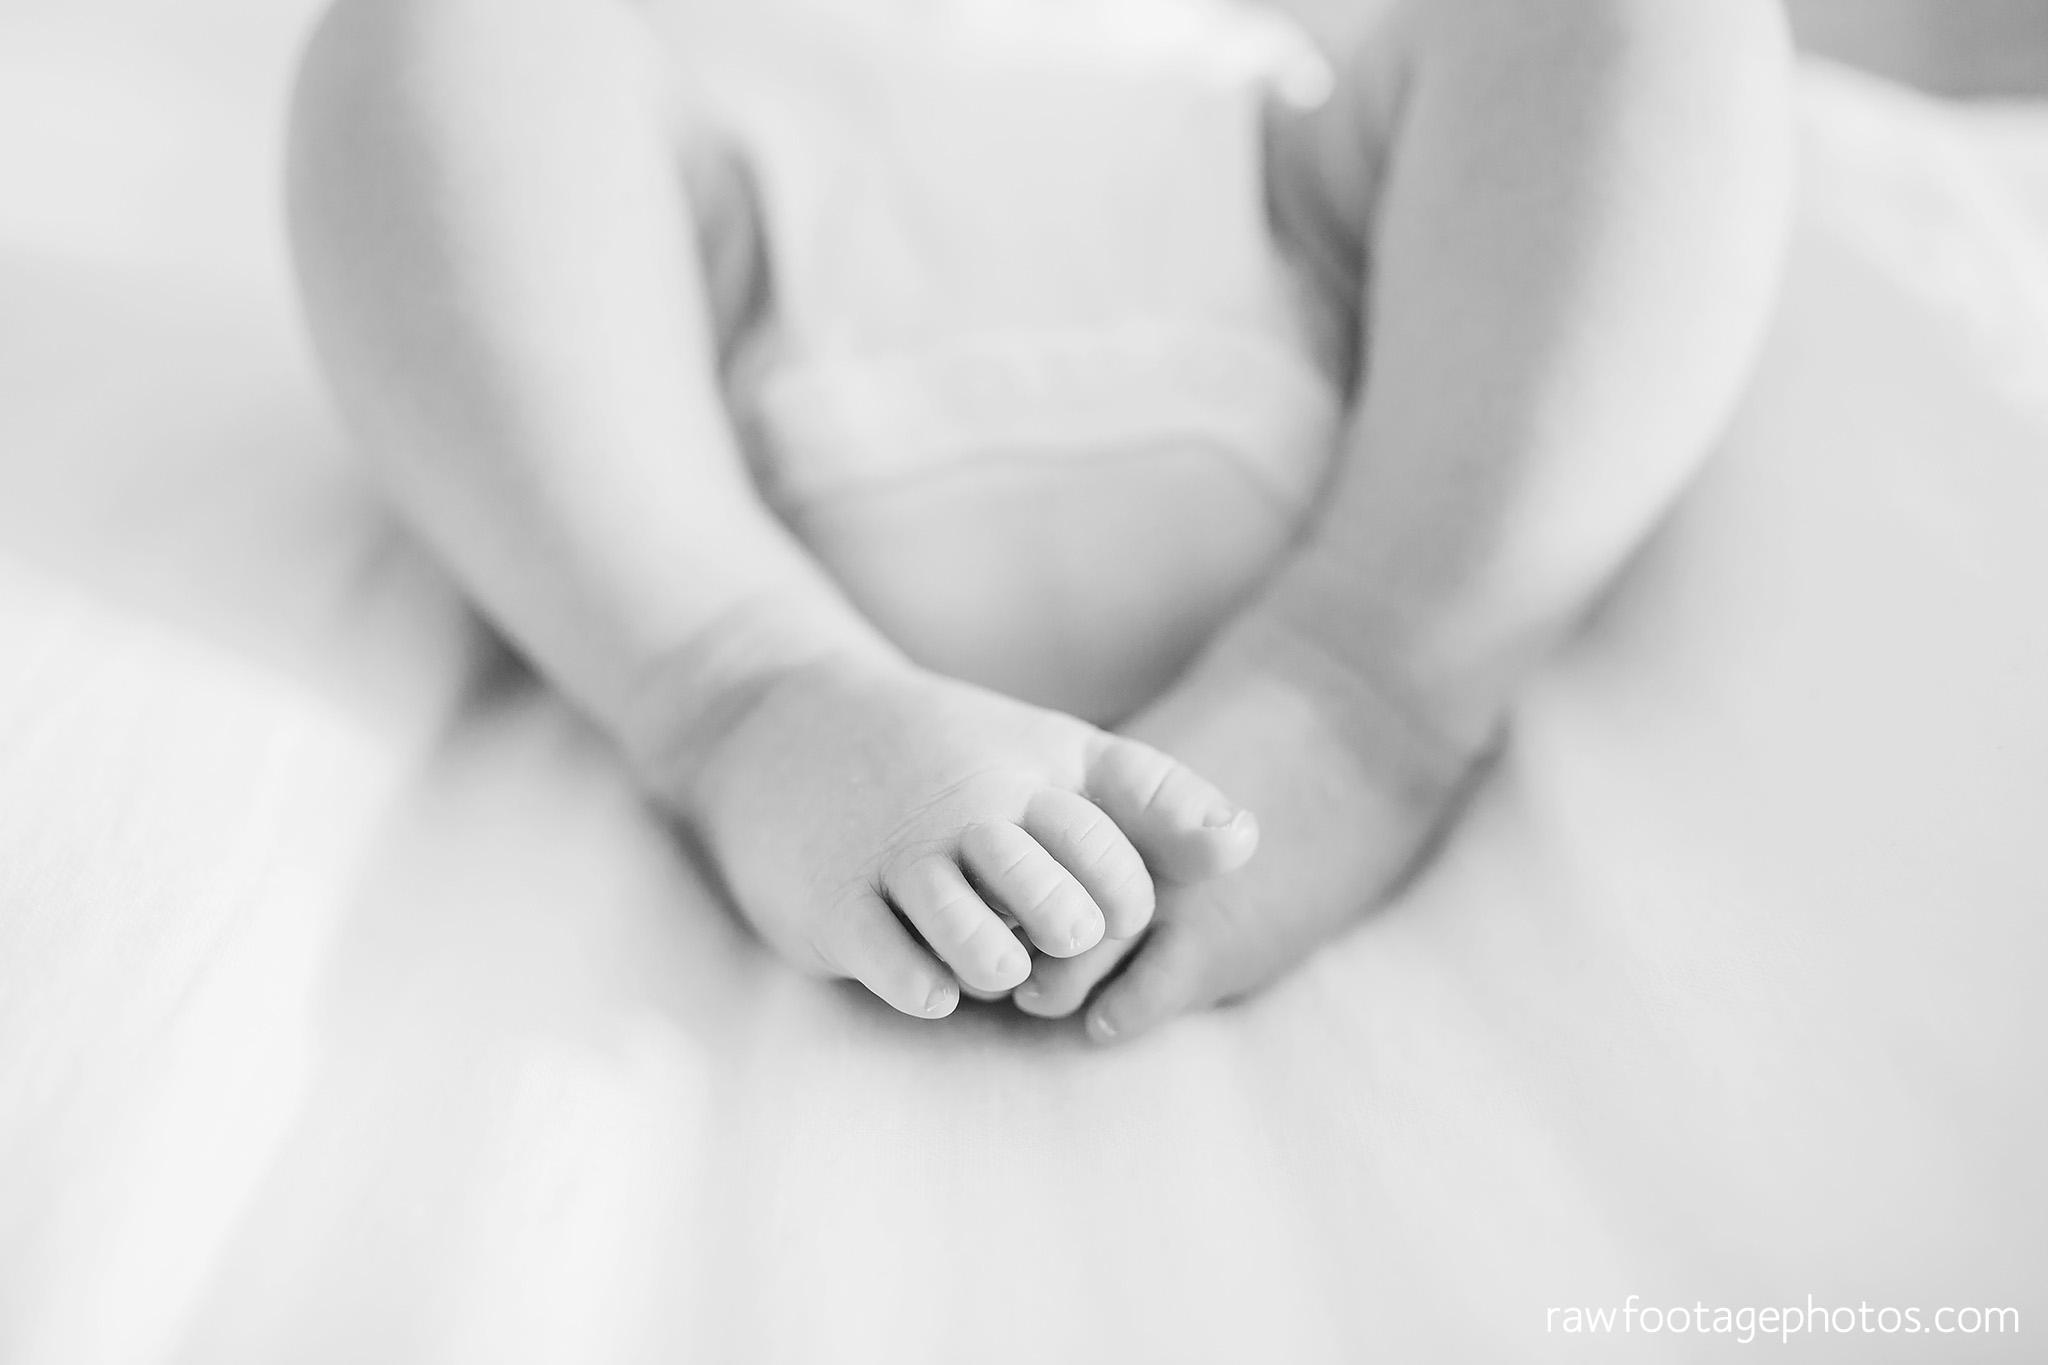 london_ontario_newborn_lifestyle_photographer-best_of_2018-raw_footage_photography055.jpg